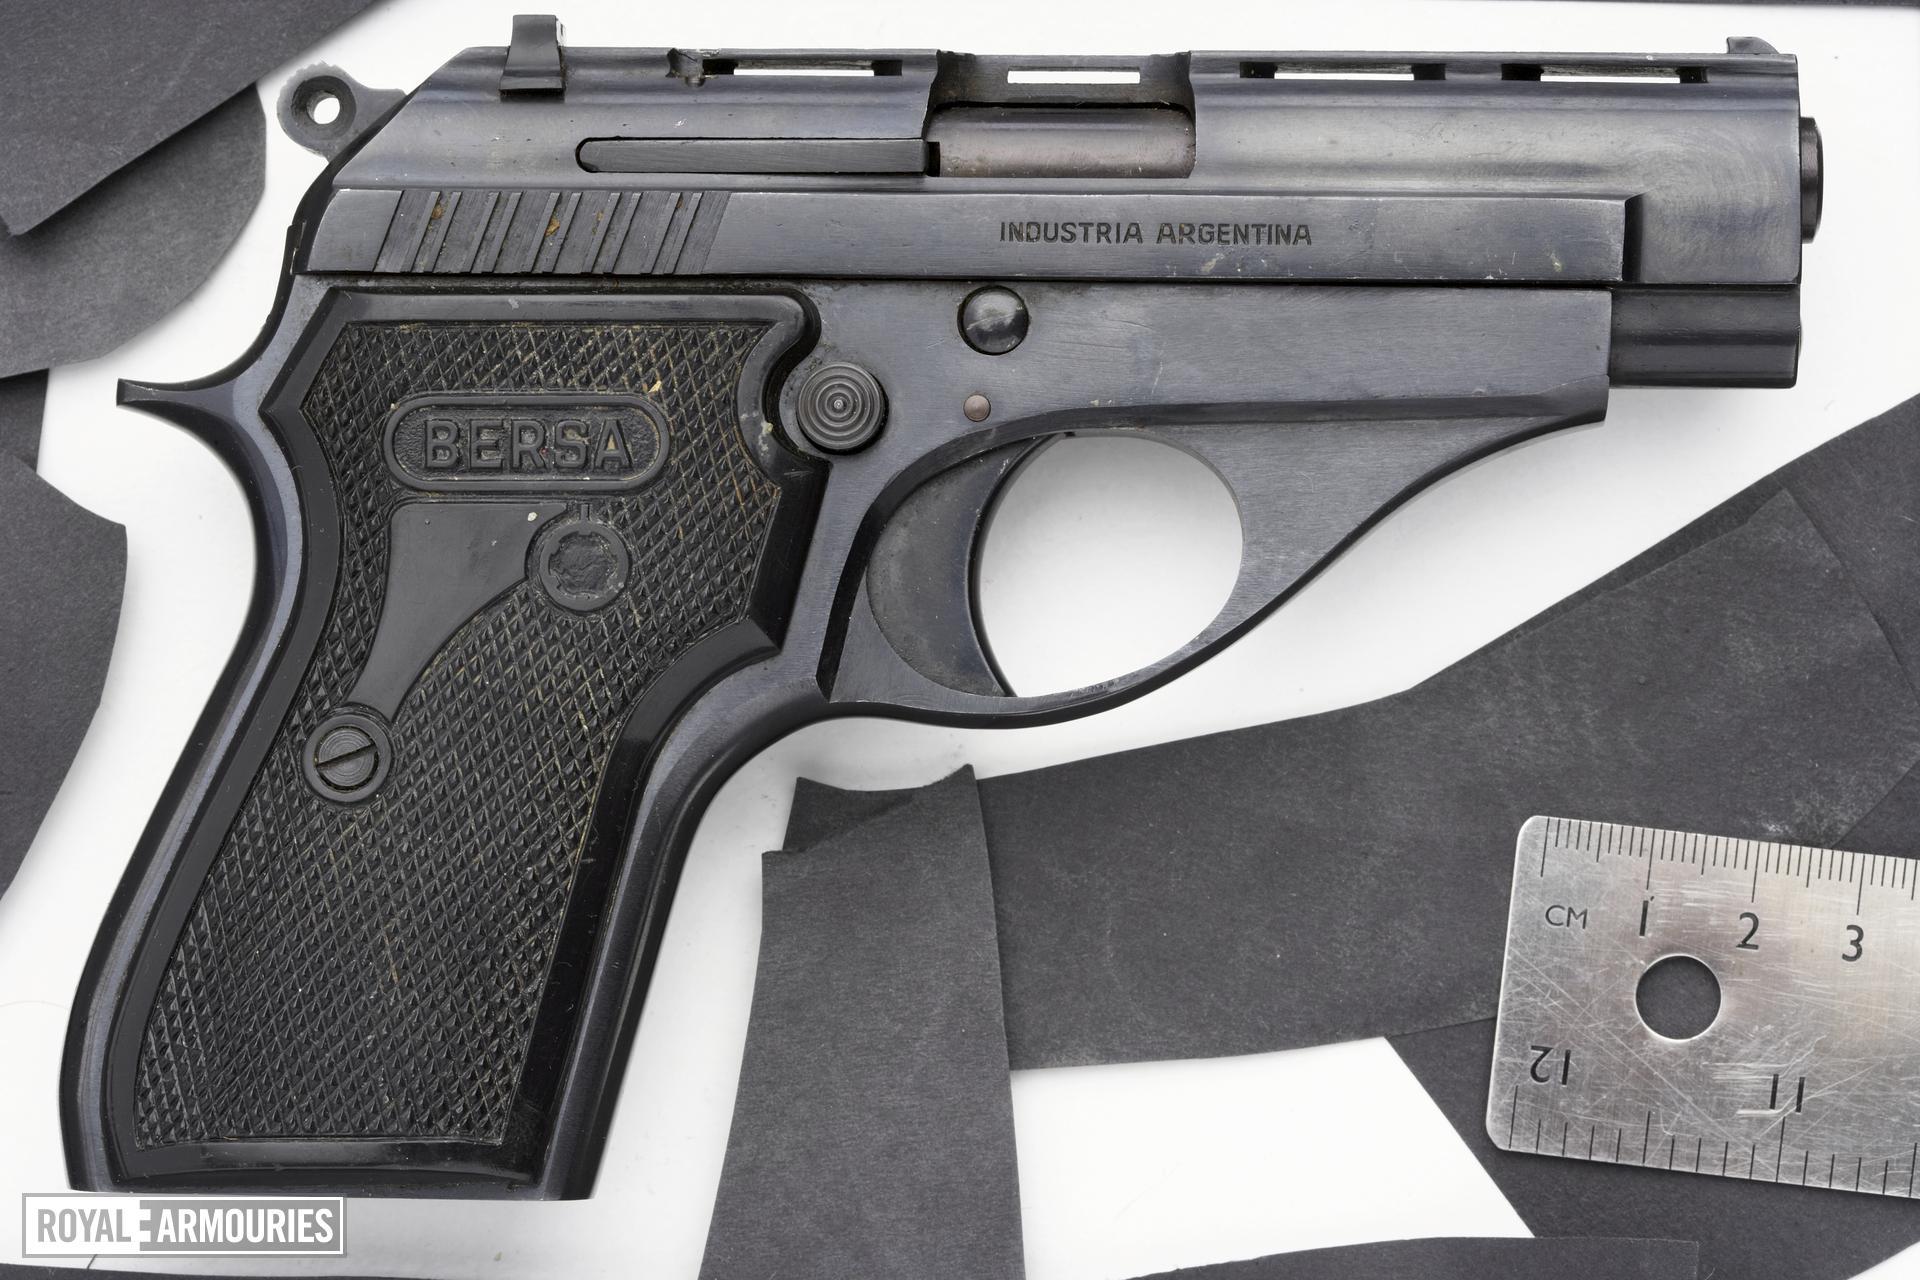 Rimfire self-loading pistol - Bersa Model 64